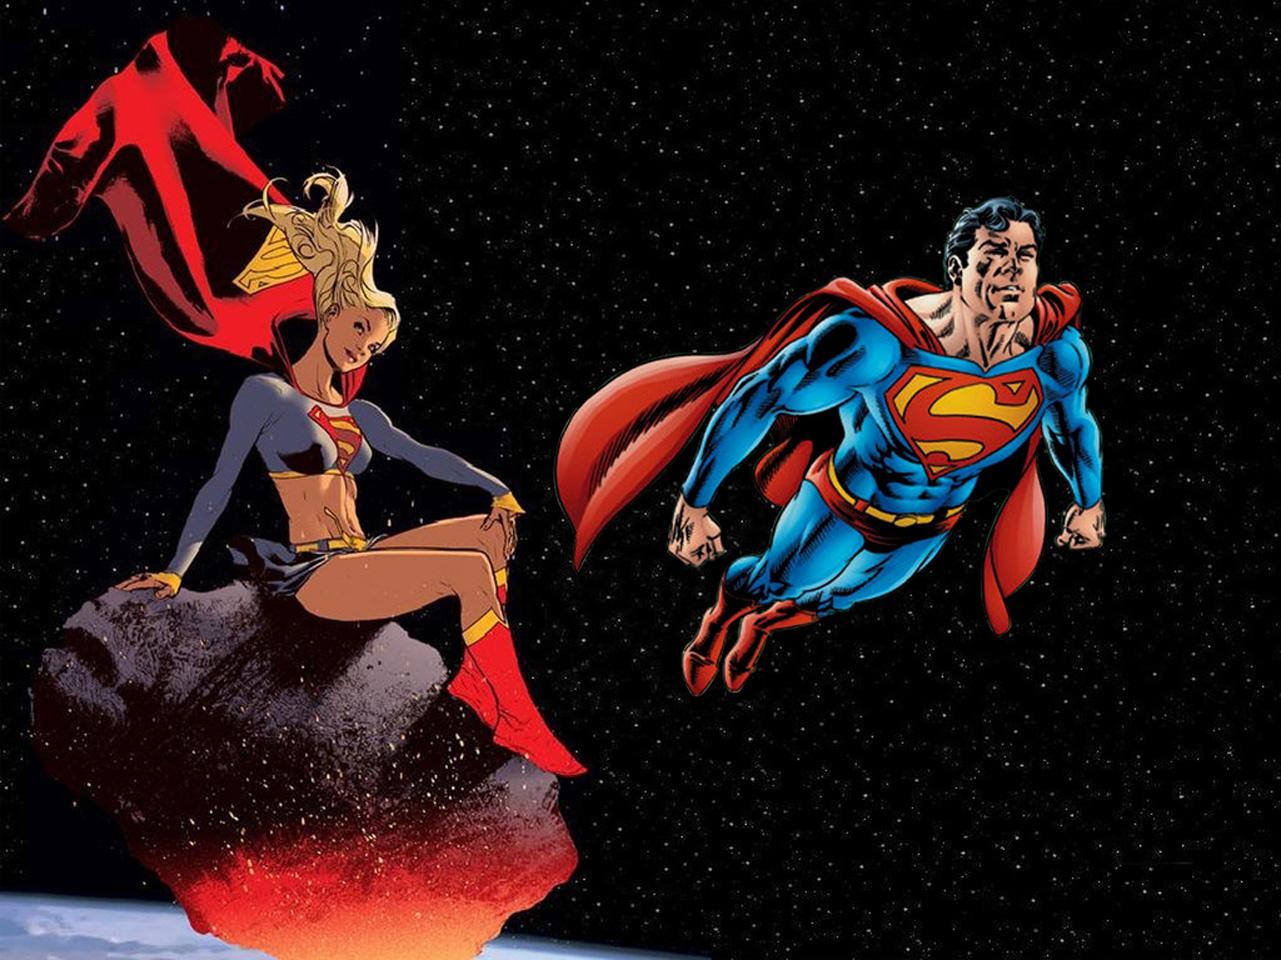 Superman Supergirl 1152 x 864 Comic Wallpapers 1281x960